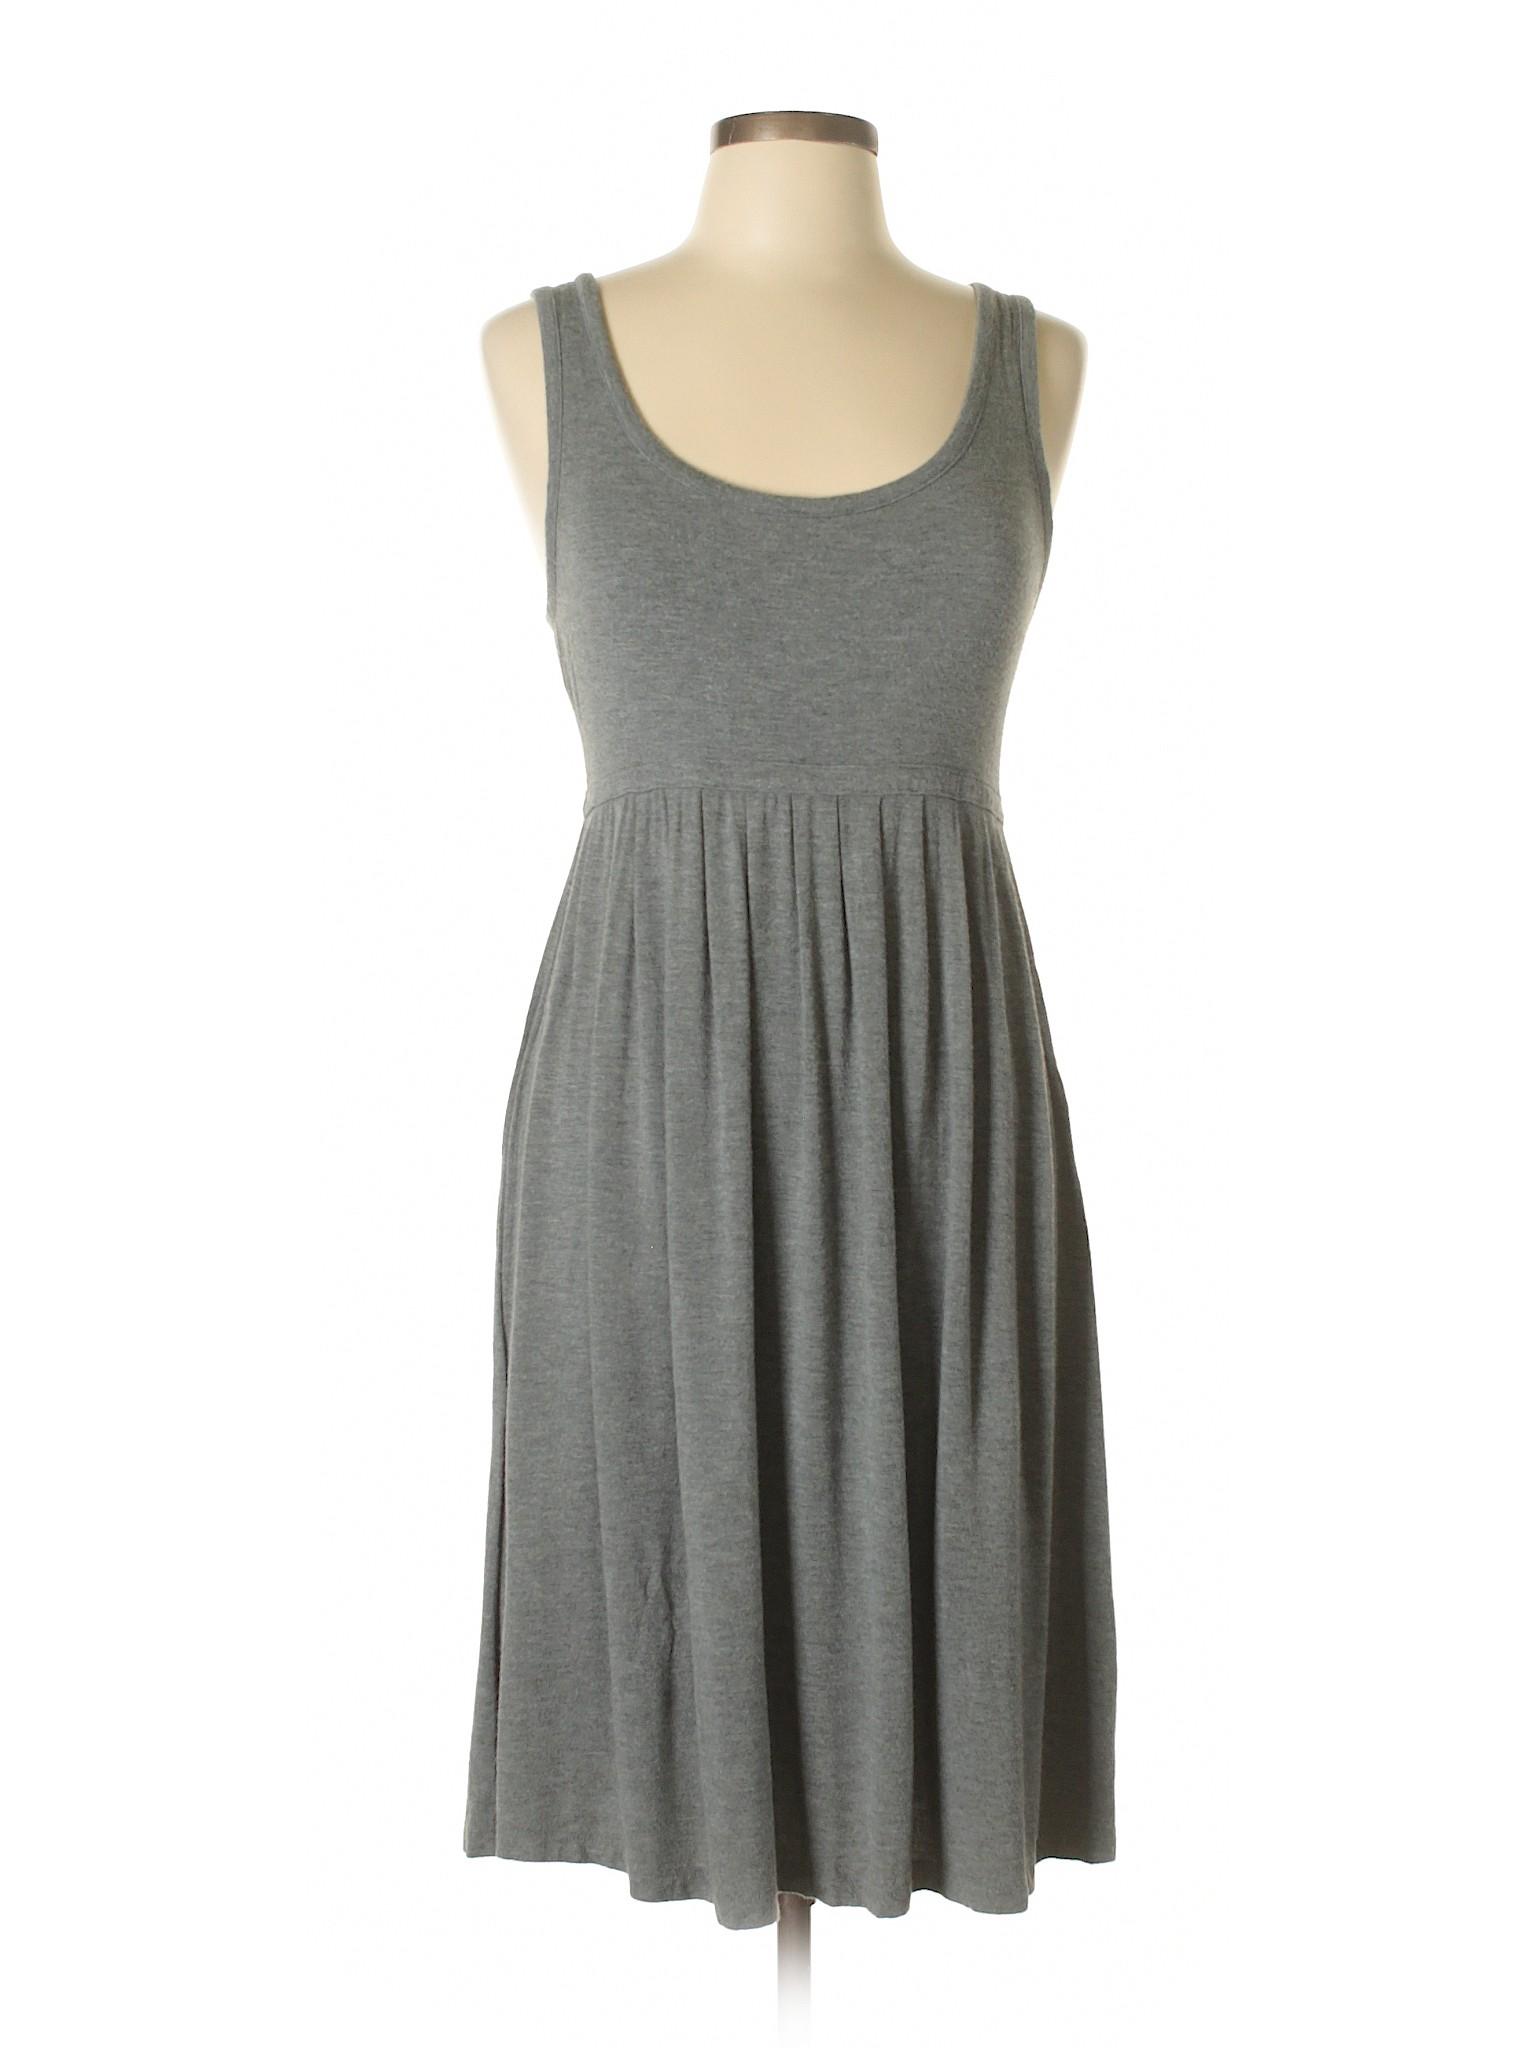 Selling Tropez Saint West Dress Casual A7pSgAqn